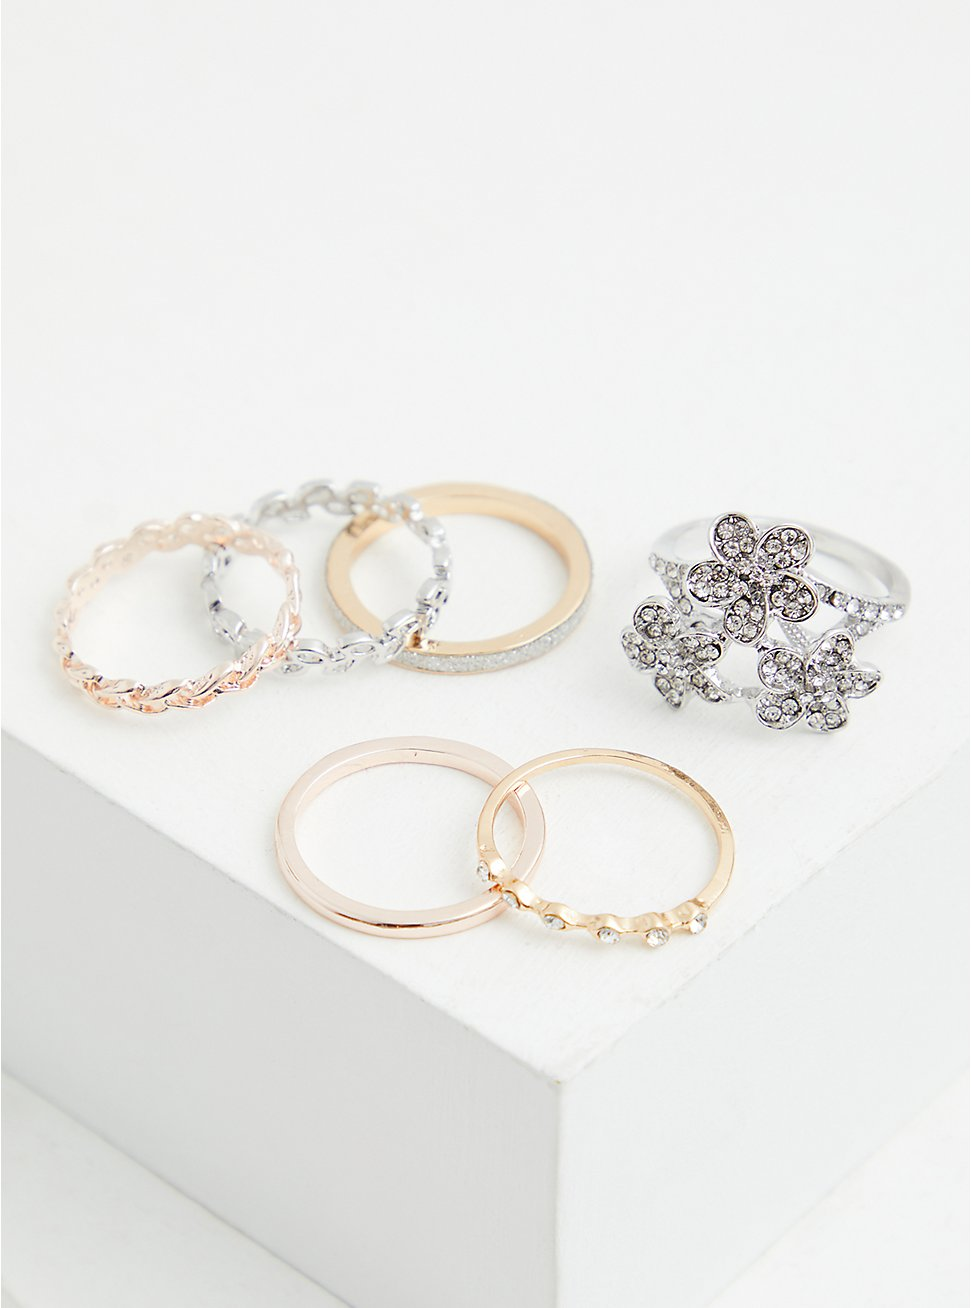 Mixed Metal Floral Stone Ring Set - Set of 6, MULTI, hi-res